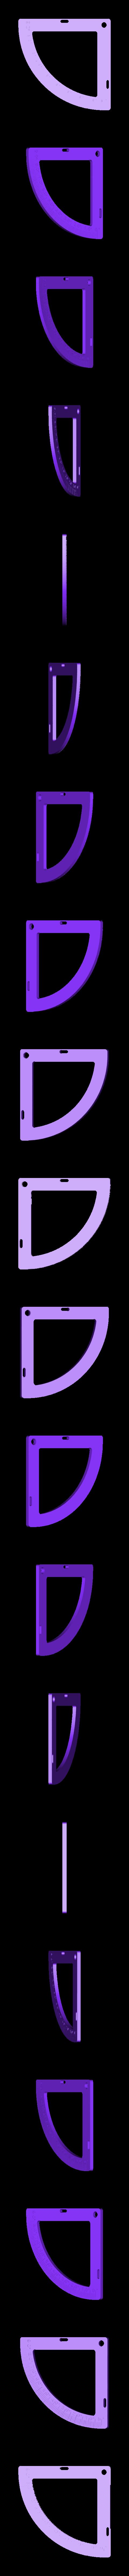 Quadrant_base.stl Download free STL file Quadrant (Sexstant predecessor) - Celestial navigation - NO Supports • 3D printing design, Mirketto